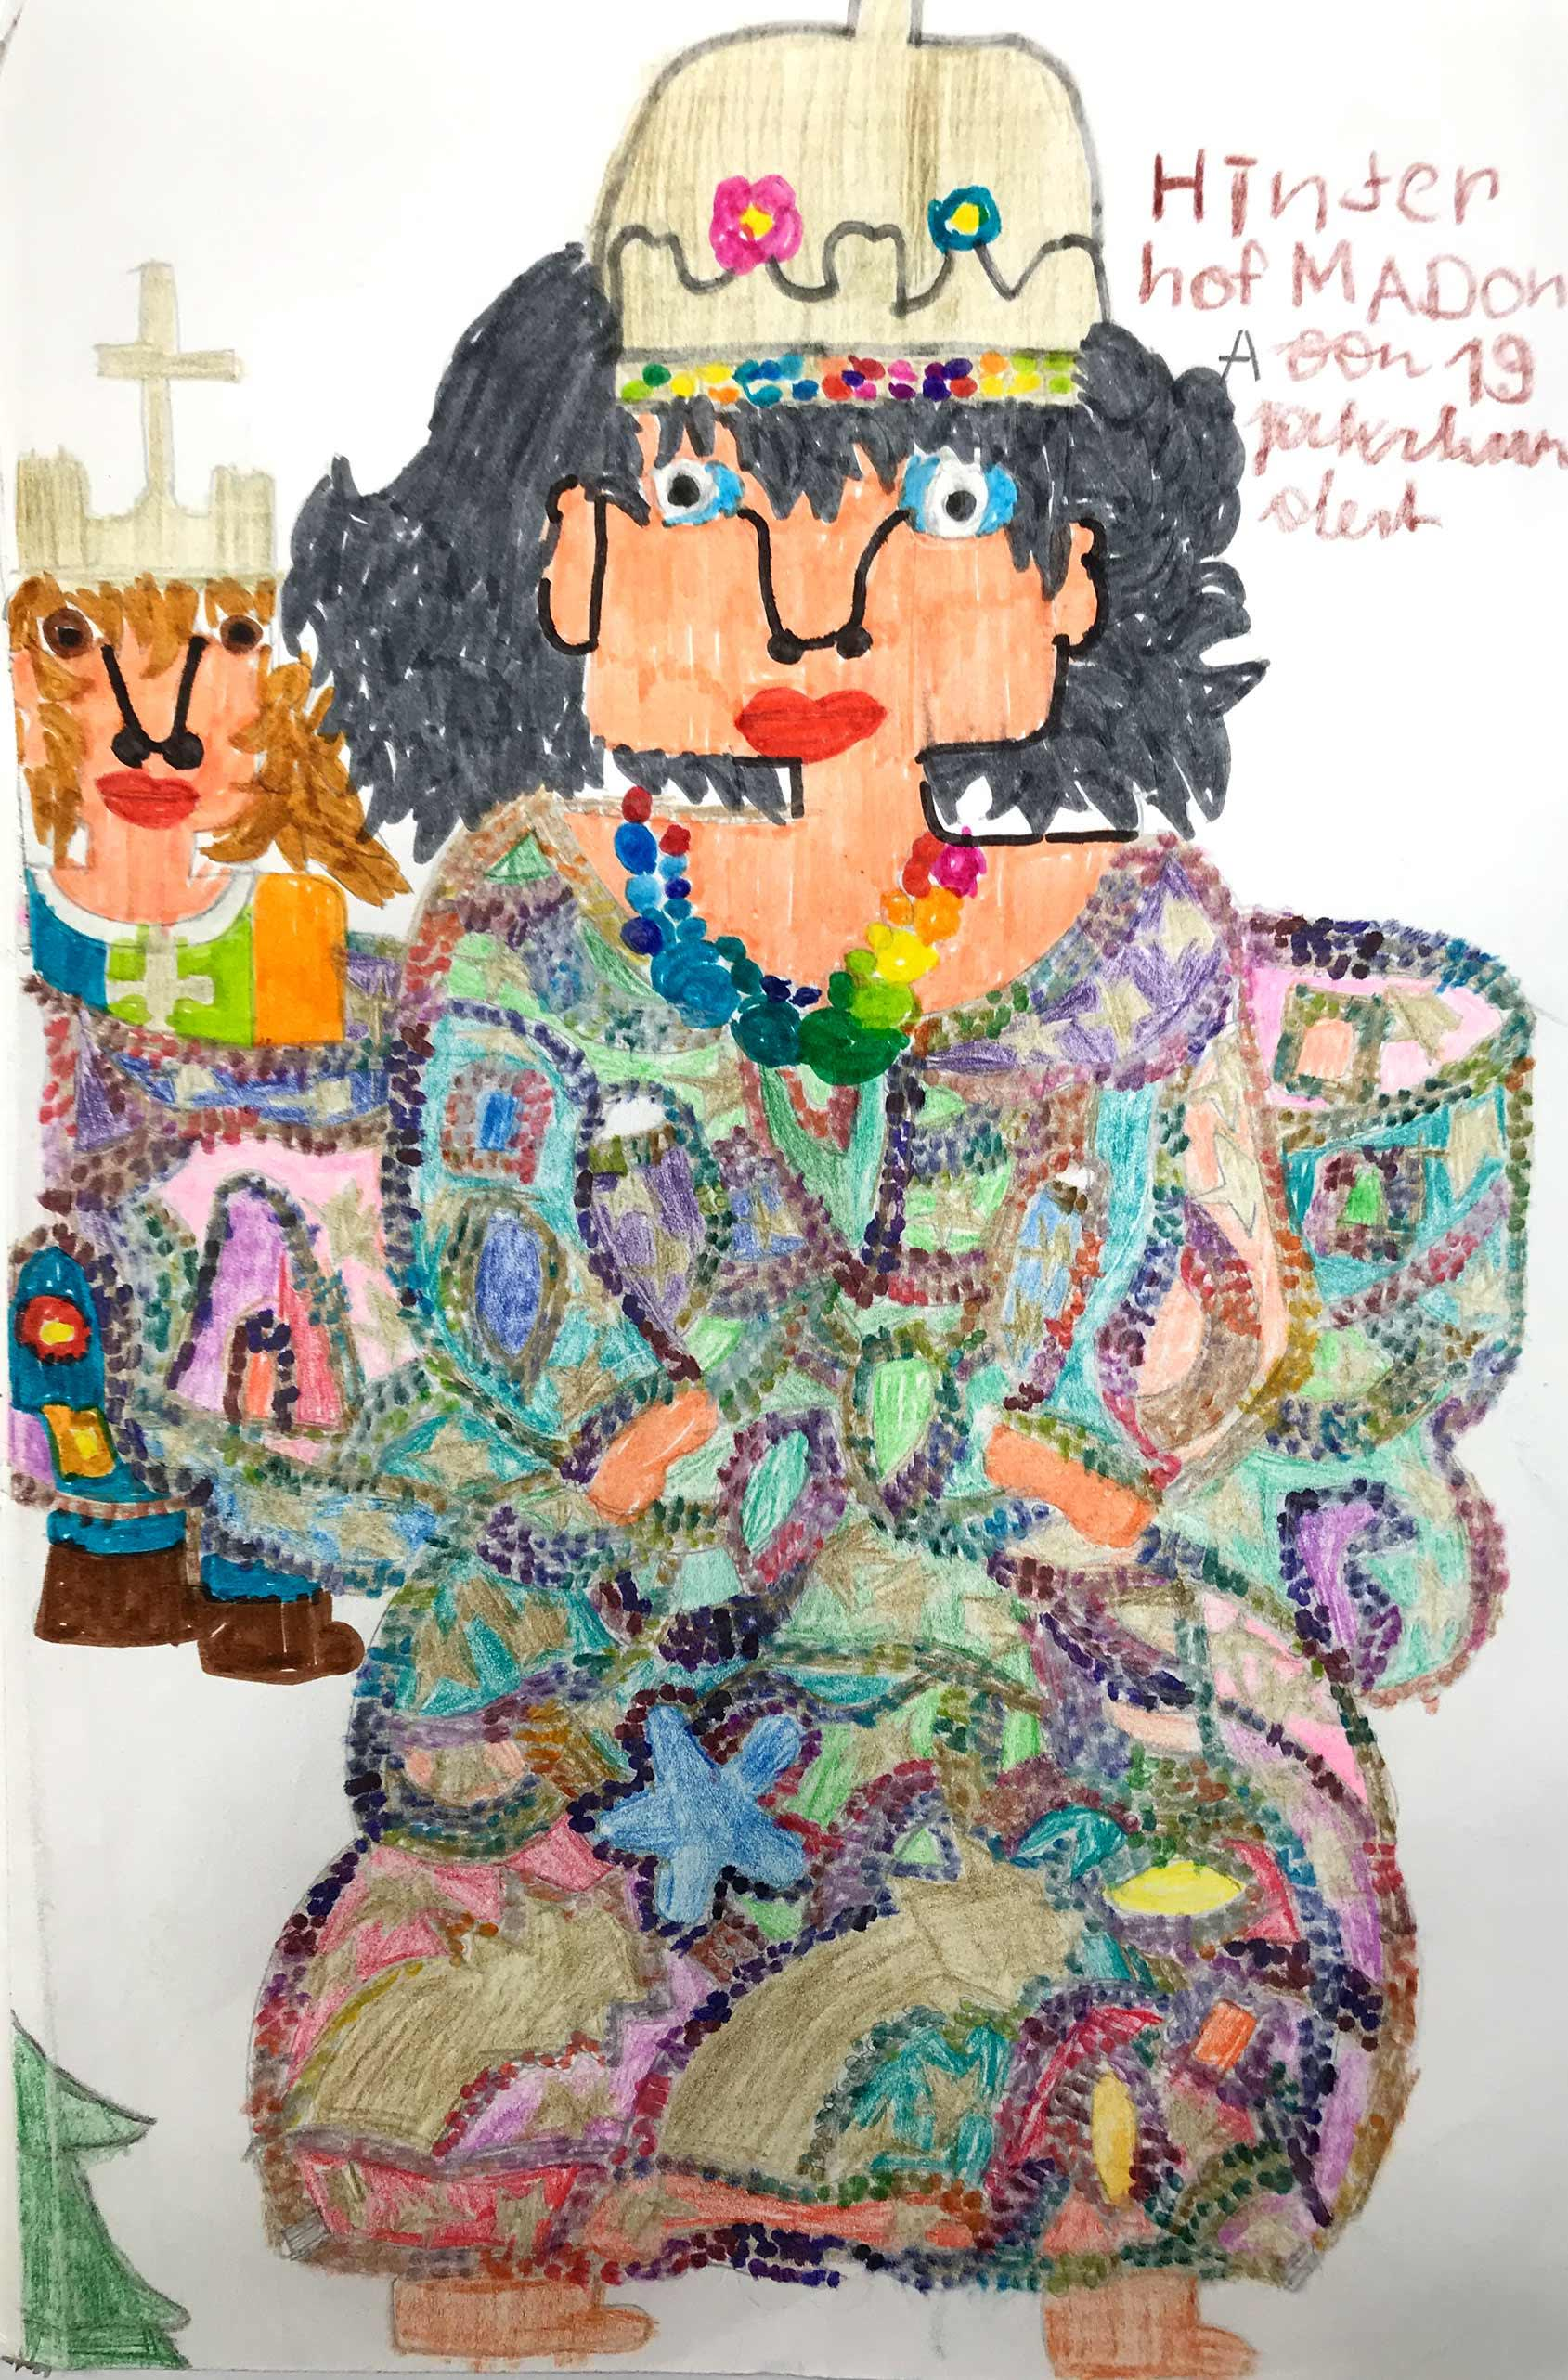 suzanne-dixon, artist, vienna, contemporary artwork